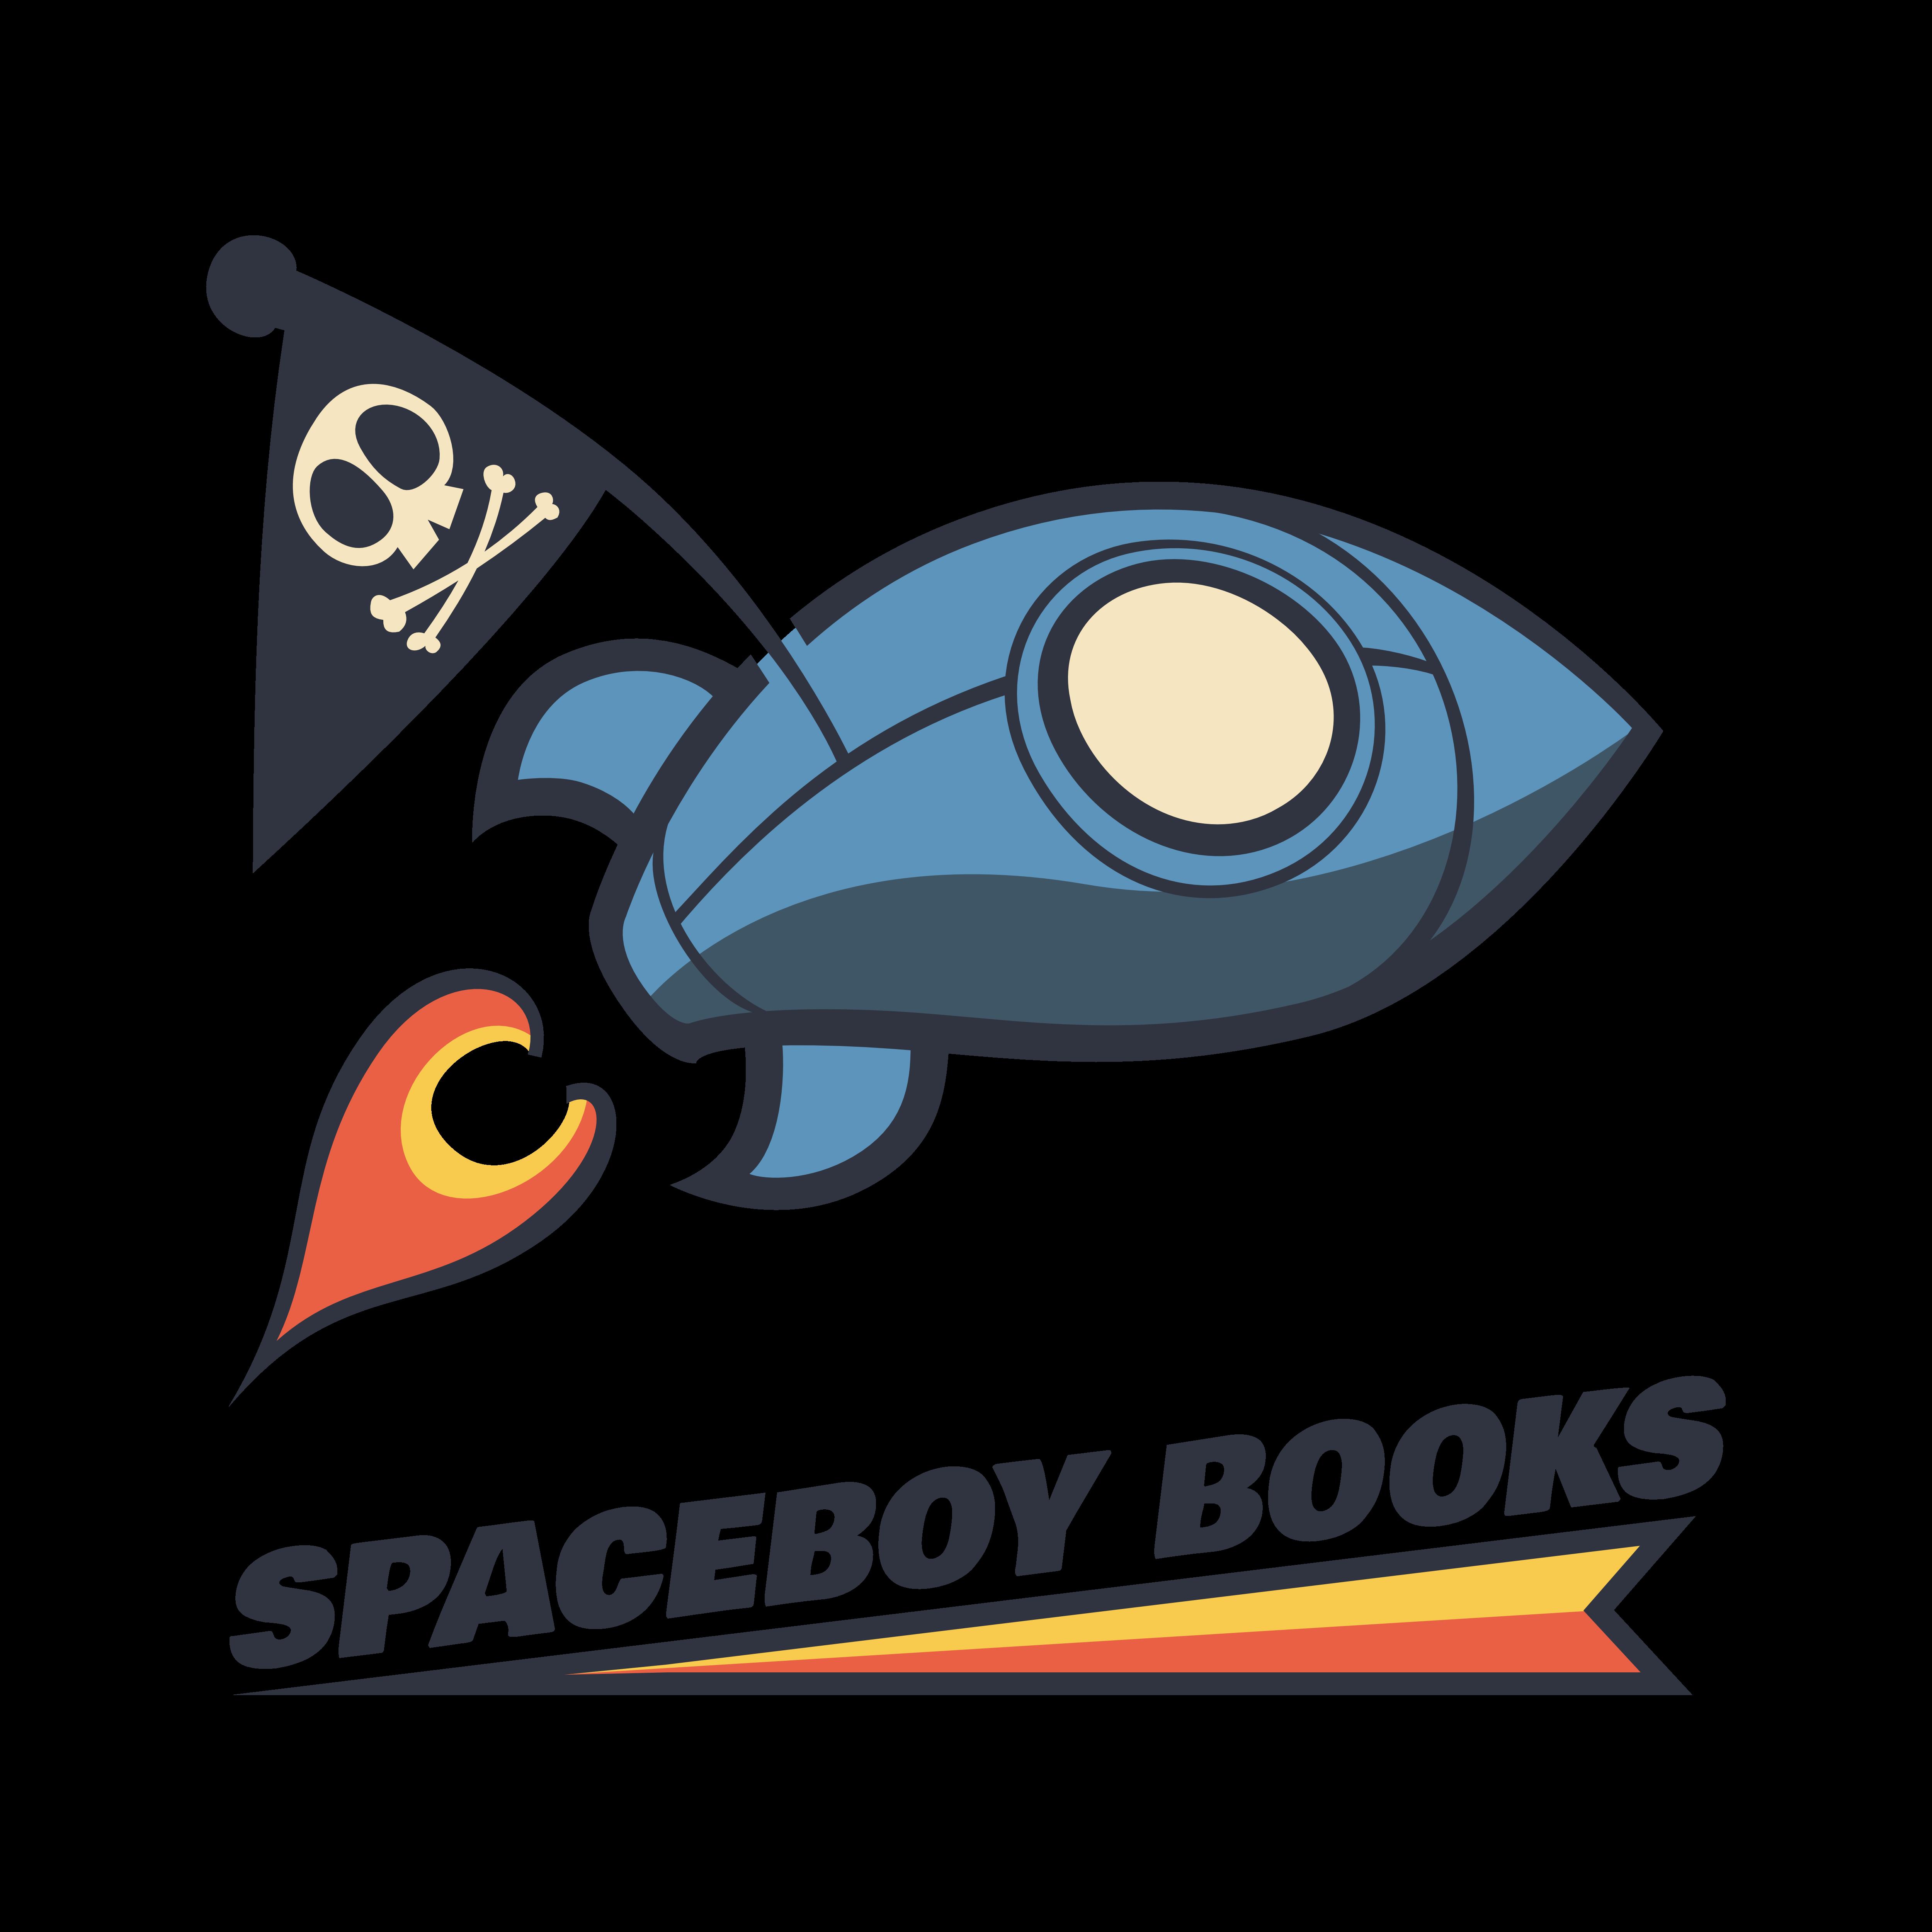 Threadless logo clipart svg transparent library Spaceboy Books LLC\'s Artist Shop | Featuring custom t-shirts ... svg transparent library